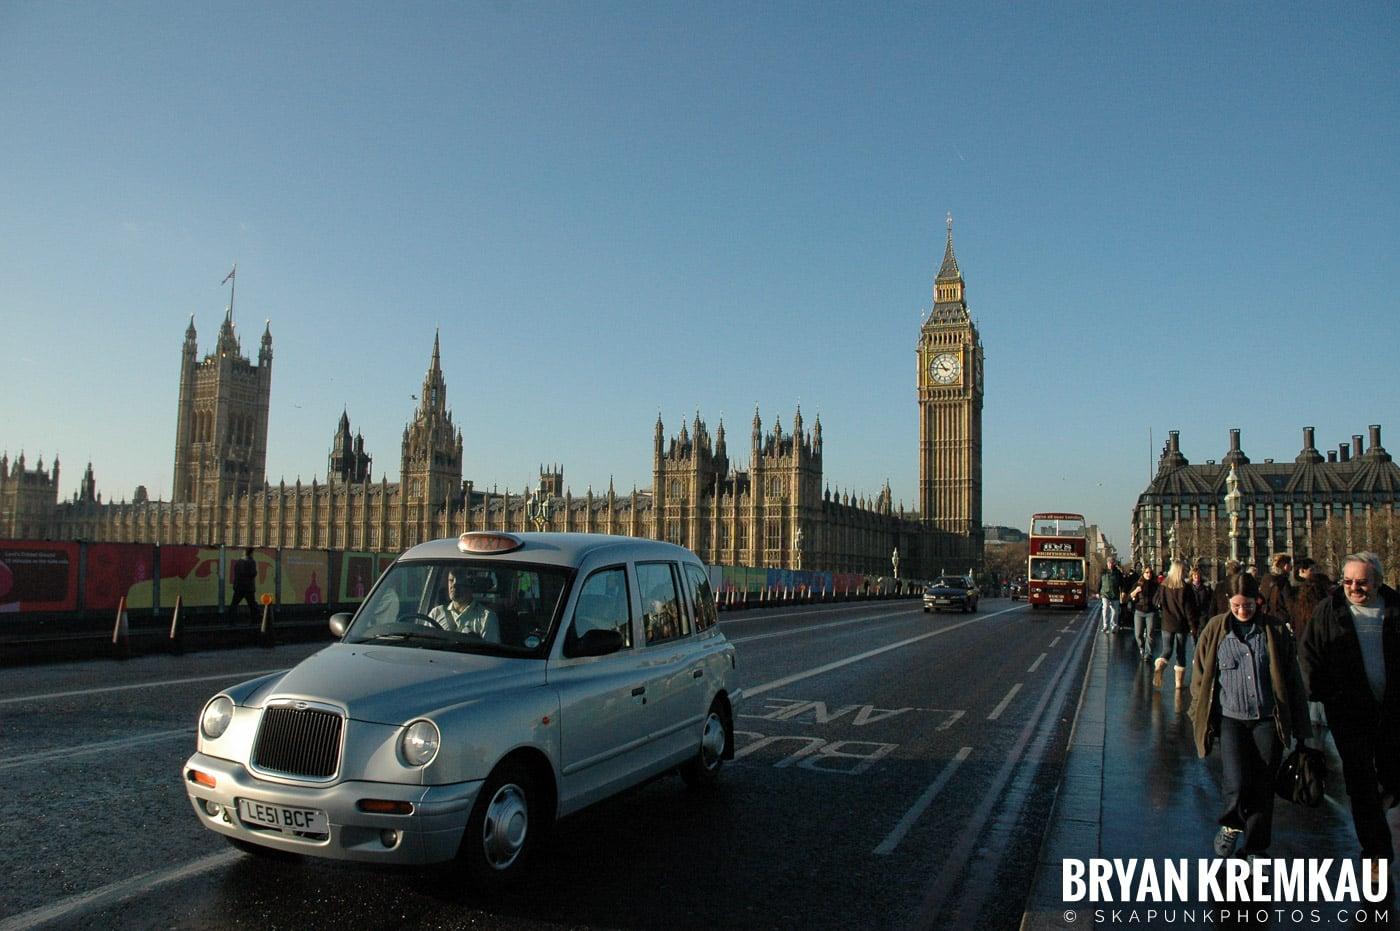 London, England - Day 4 - 12.19.05 (41)